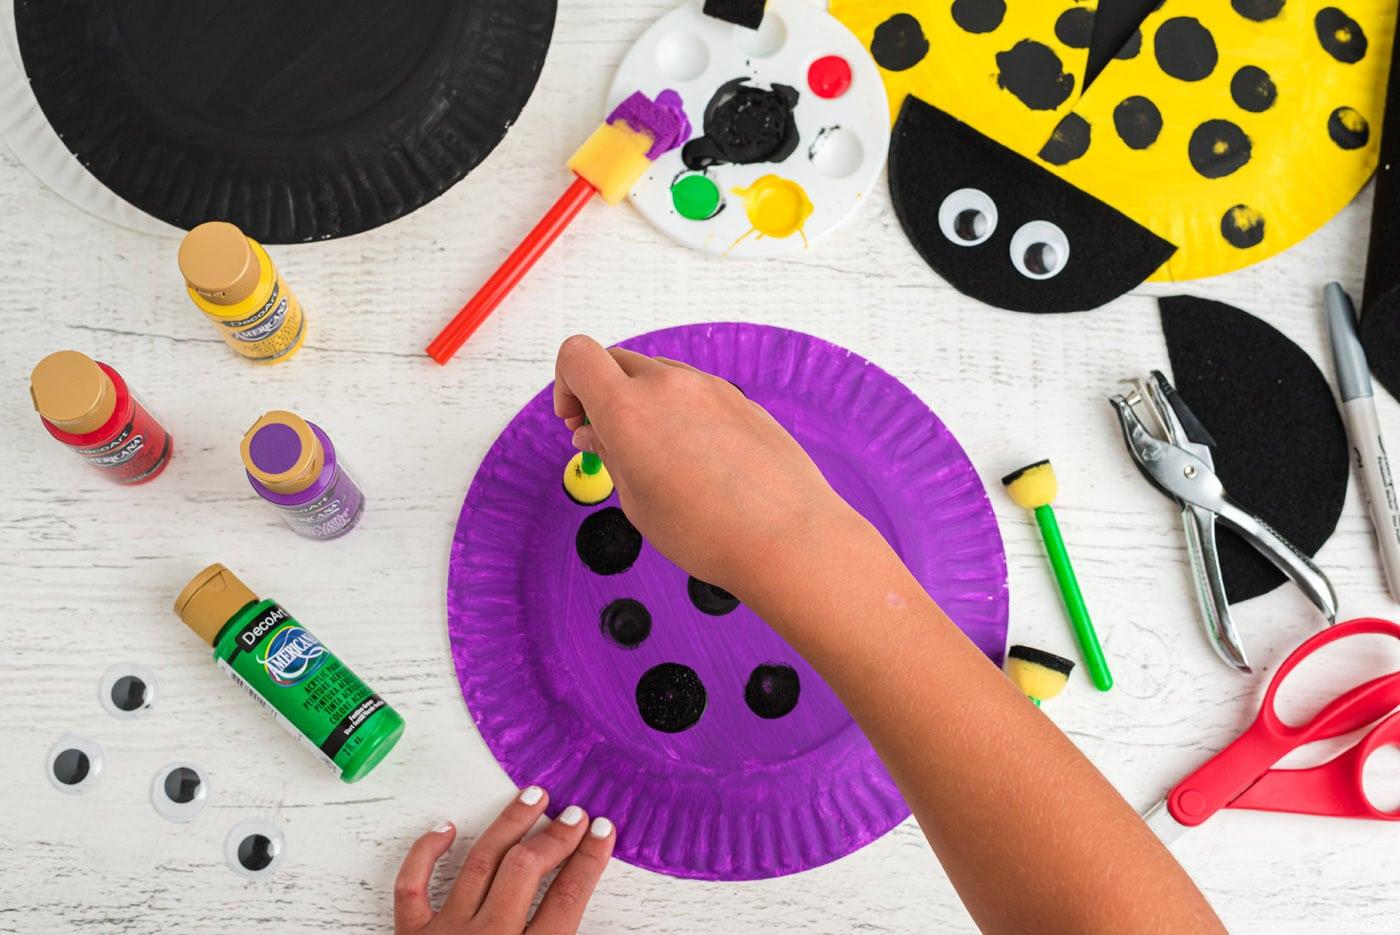 kids hand using a pouncer sponge to make black polka dots onto paper plate